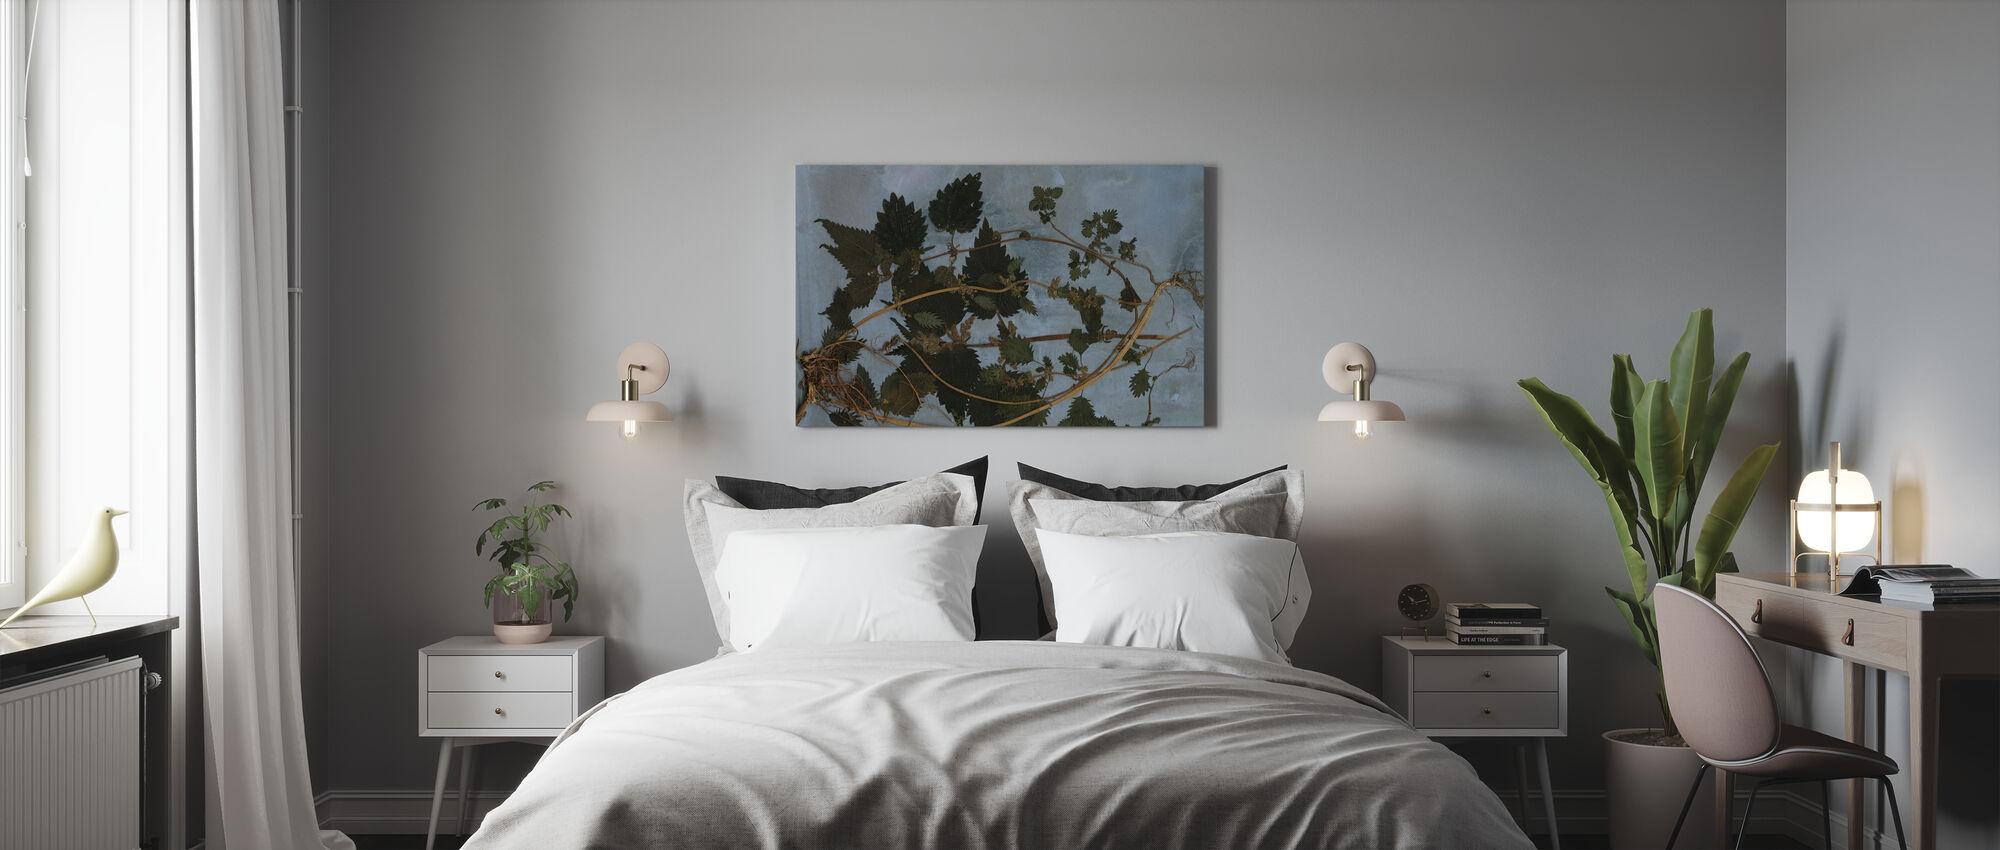 Brandnetels - Canvas print - Slaapkamer